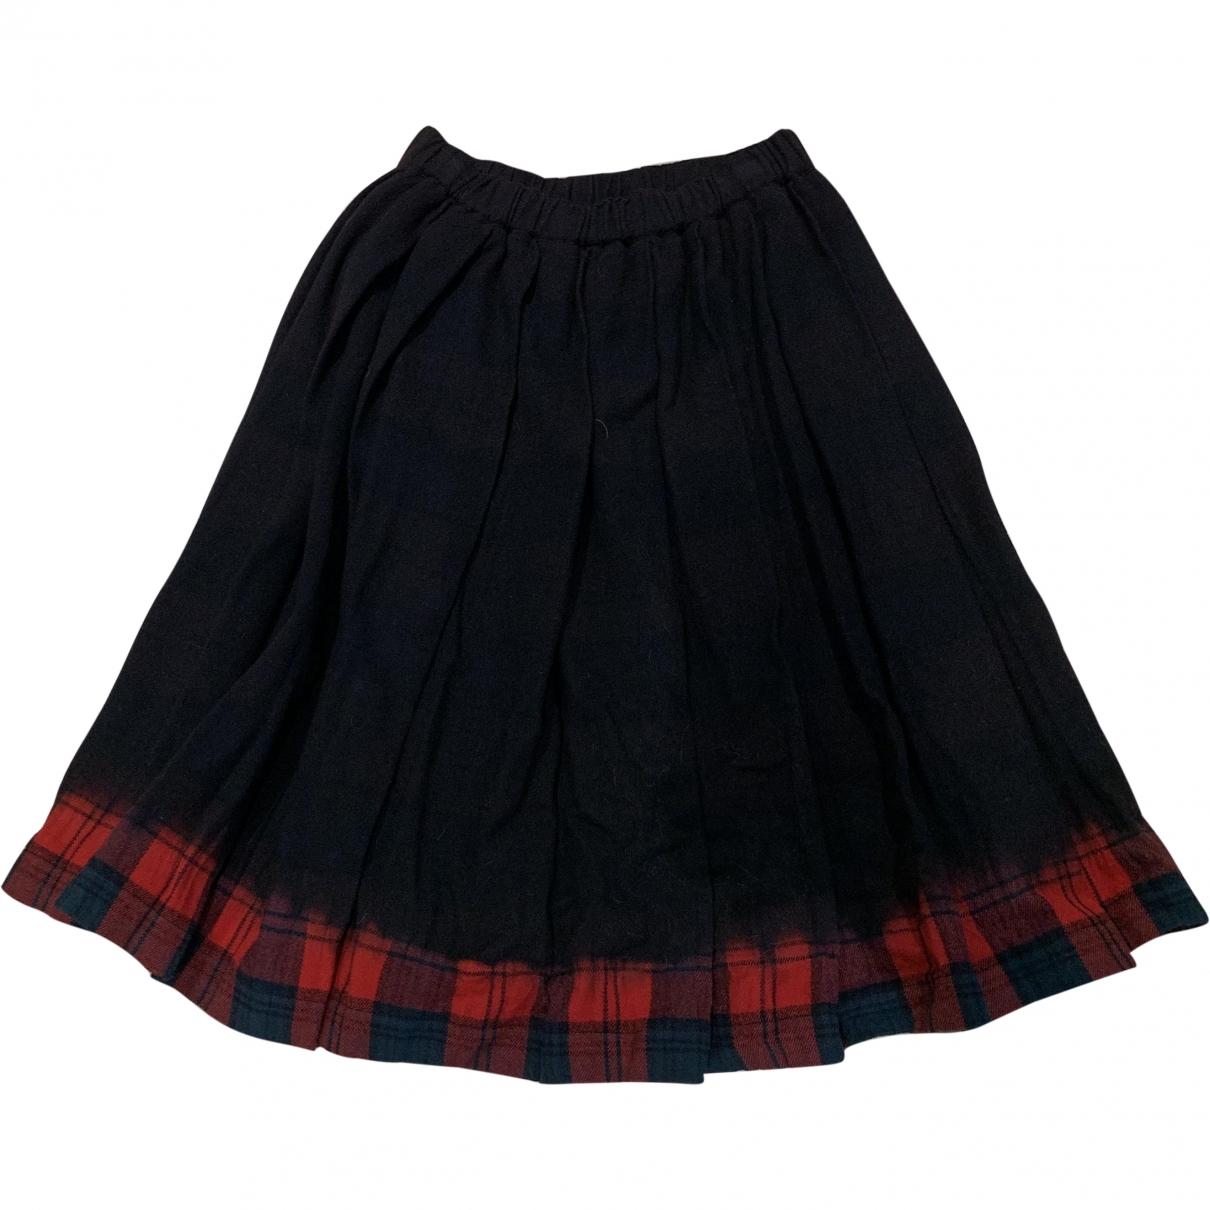 Comme Des Garcons \N Black Wool skirt for Women XS International